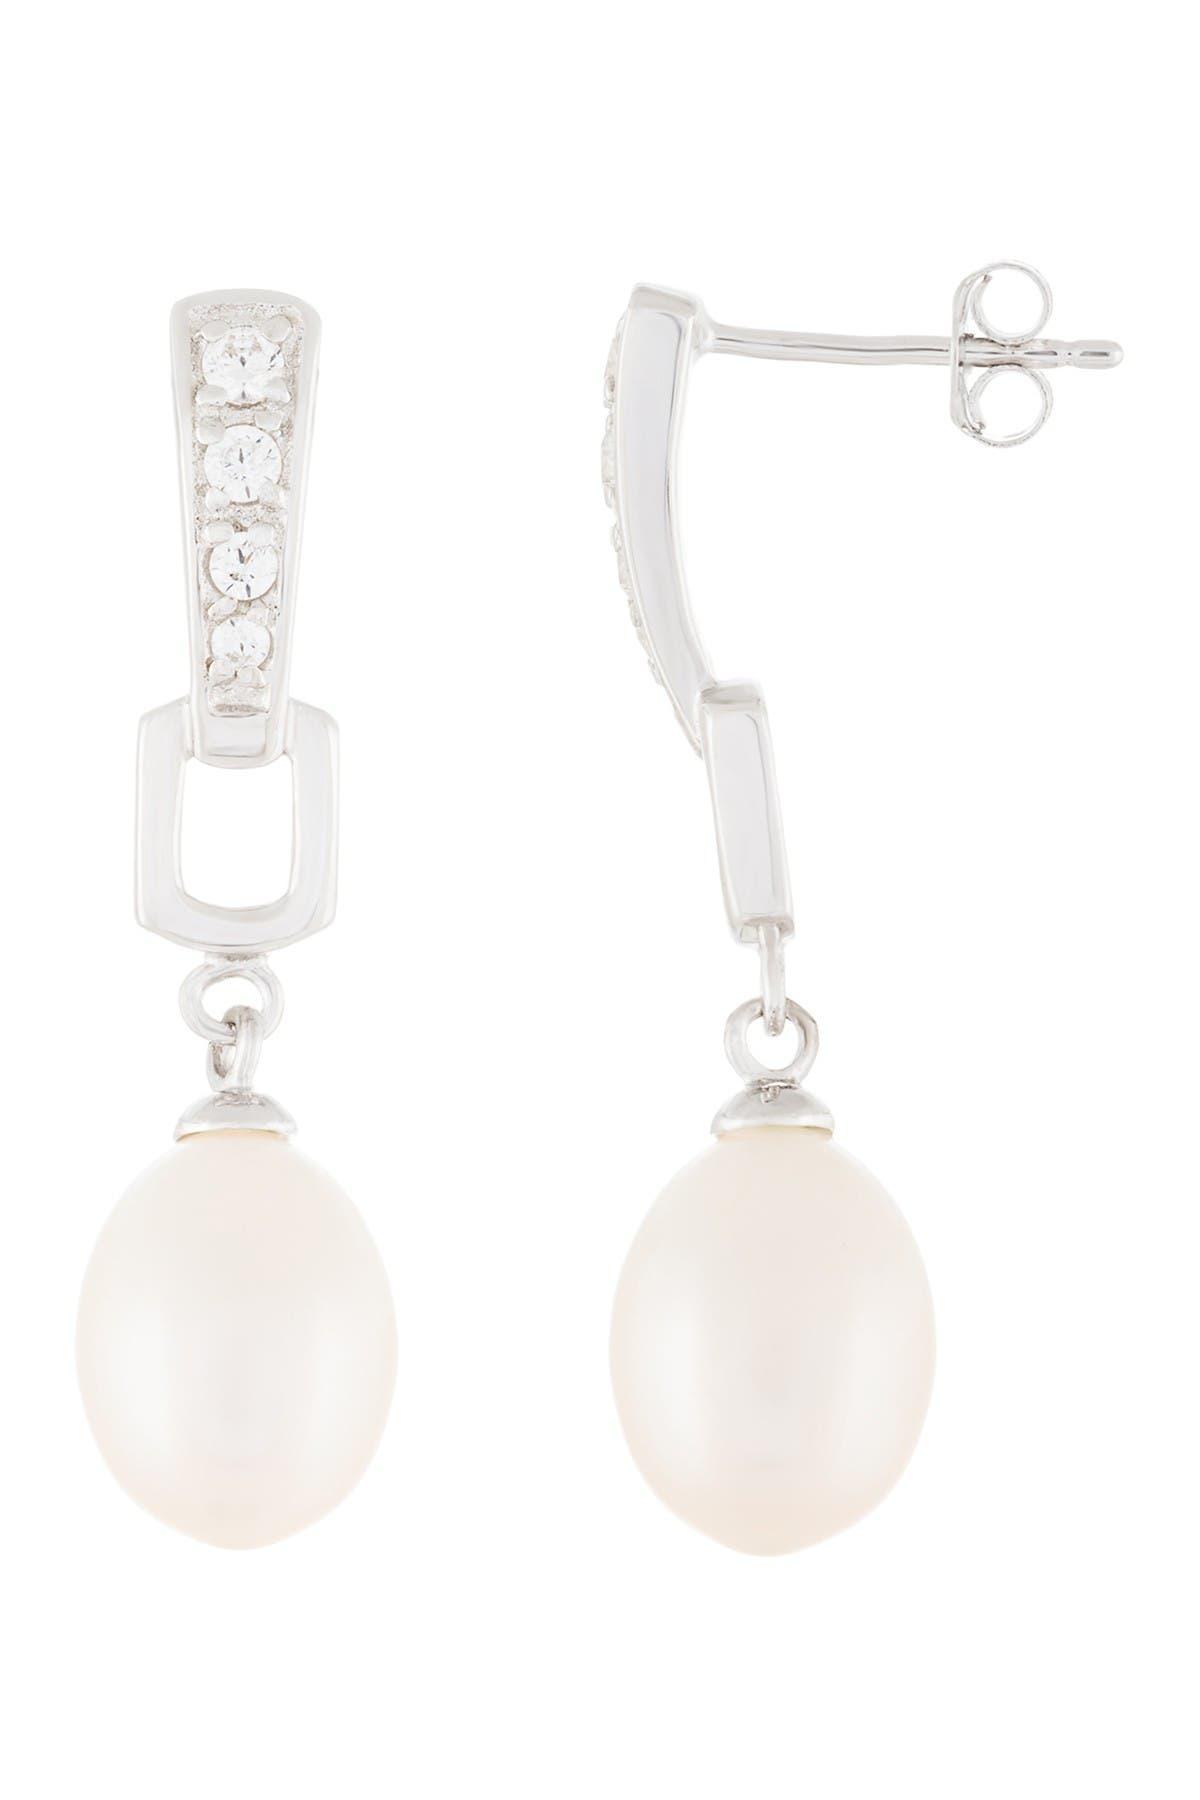 Image of Splendid Pearls Sterling Silver 8.5-9mm White Freshwater Pearl & CZ Dangle Earrings